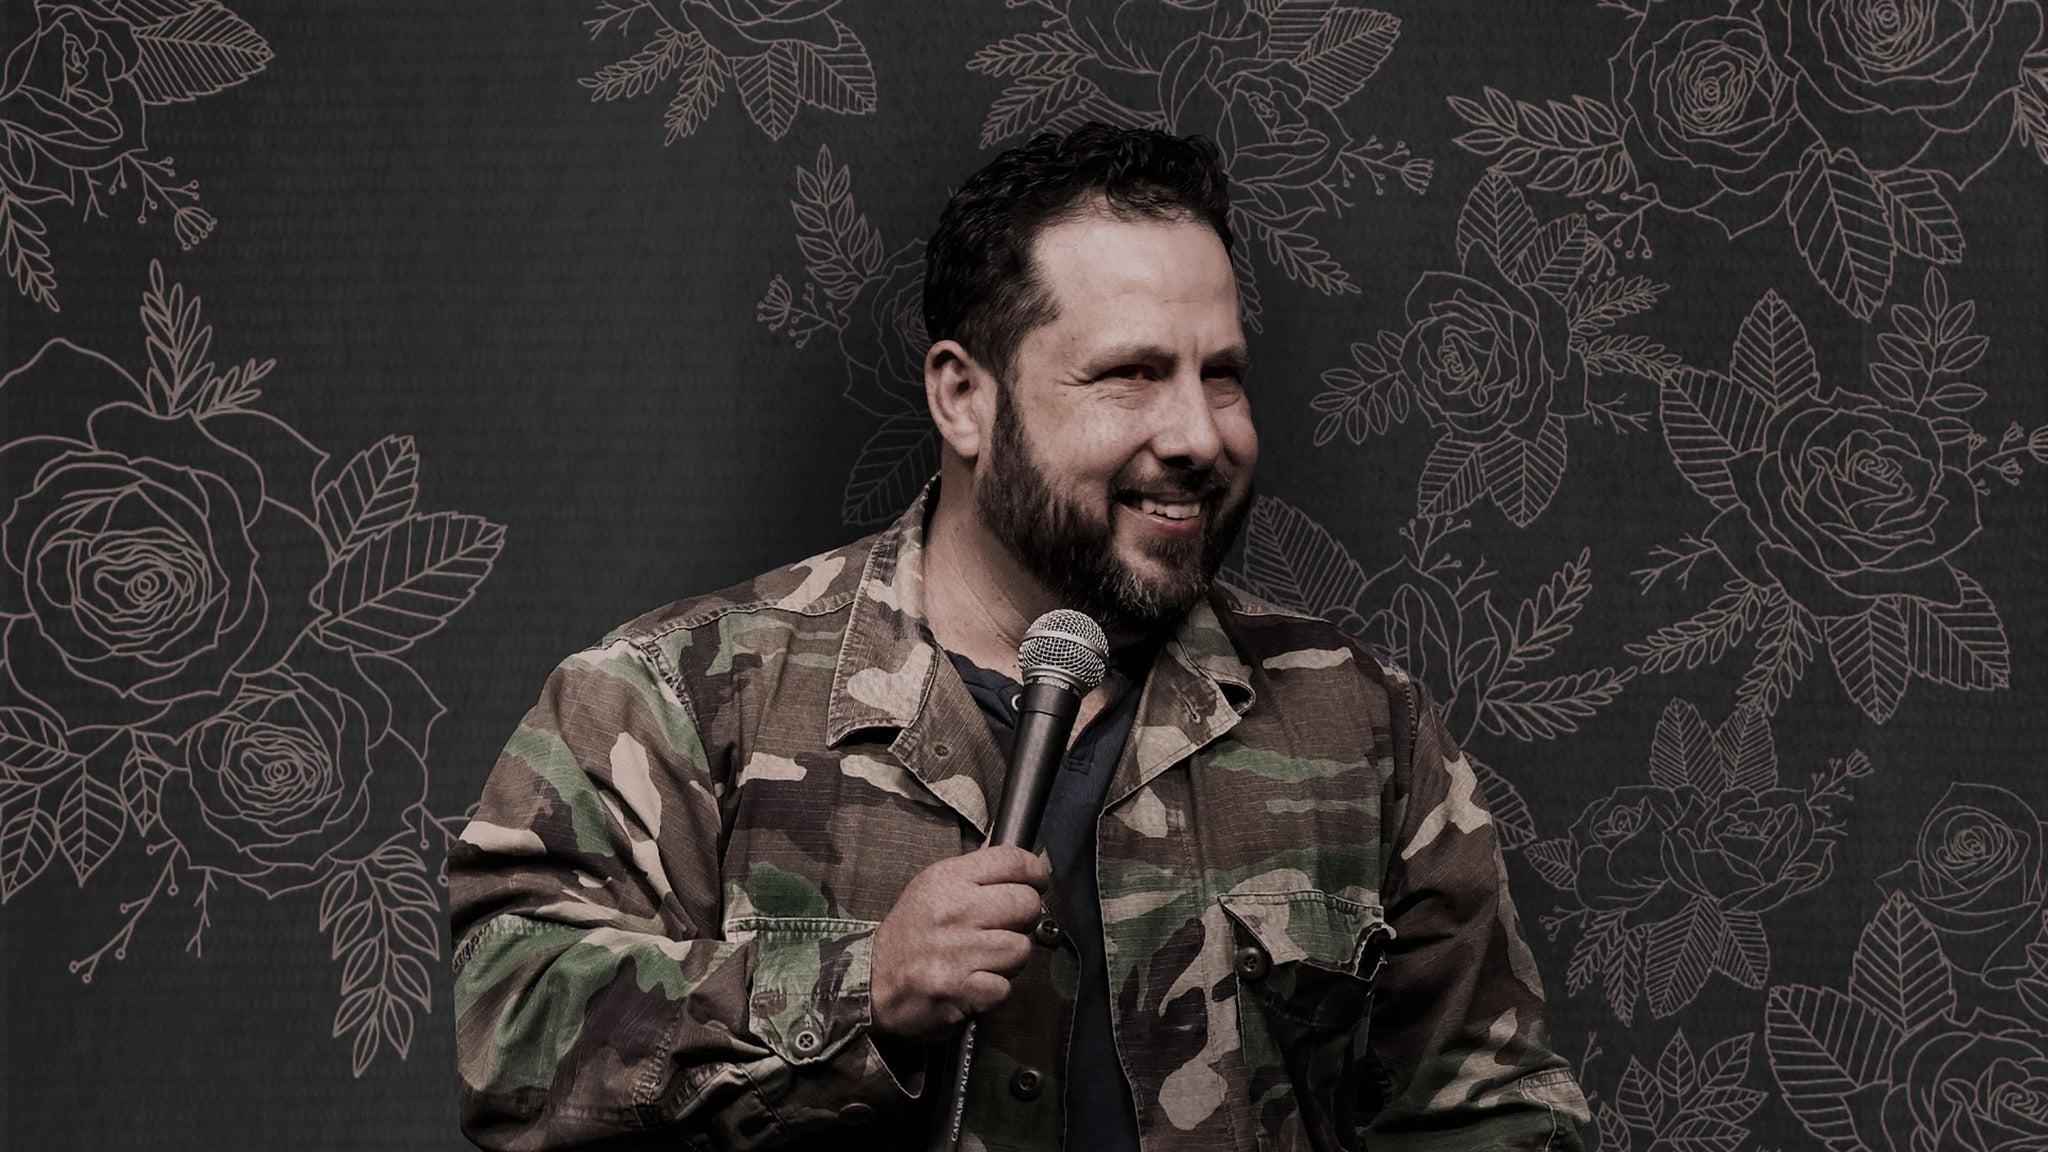 Steve Treviño – I Speak Wife Tour 2021 at Brea Improv